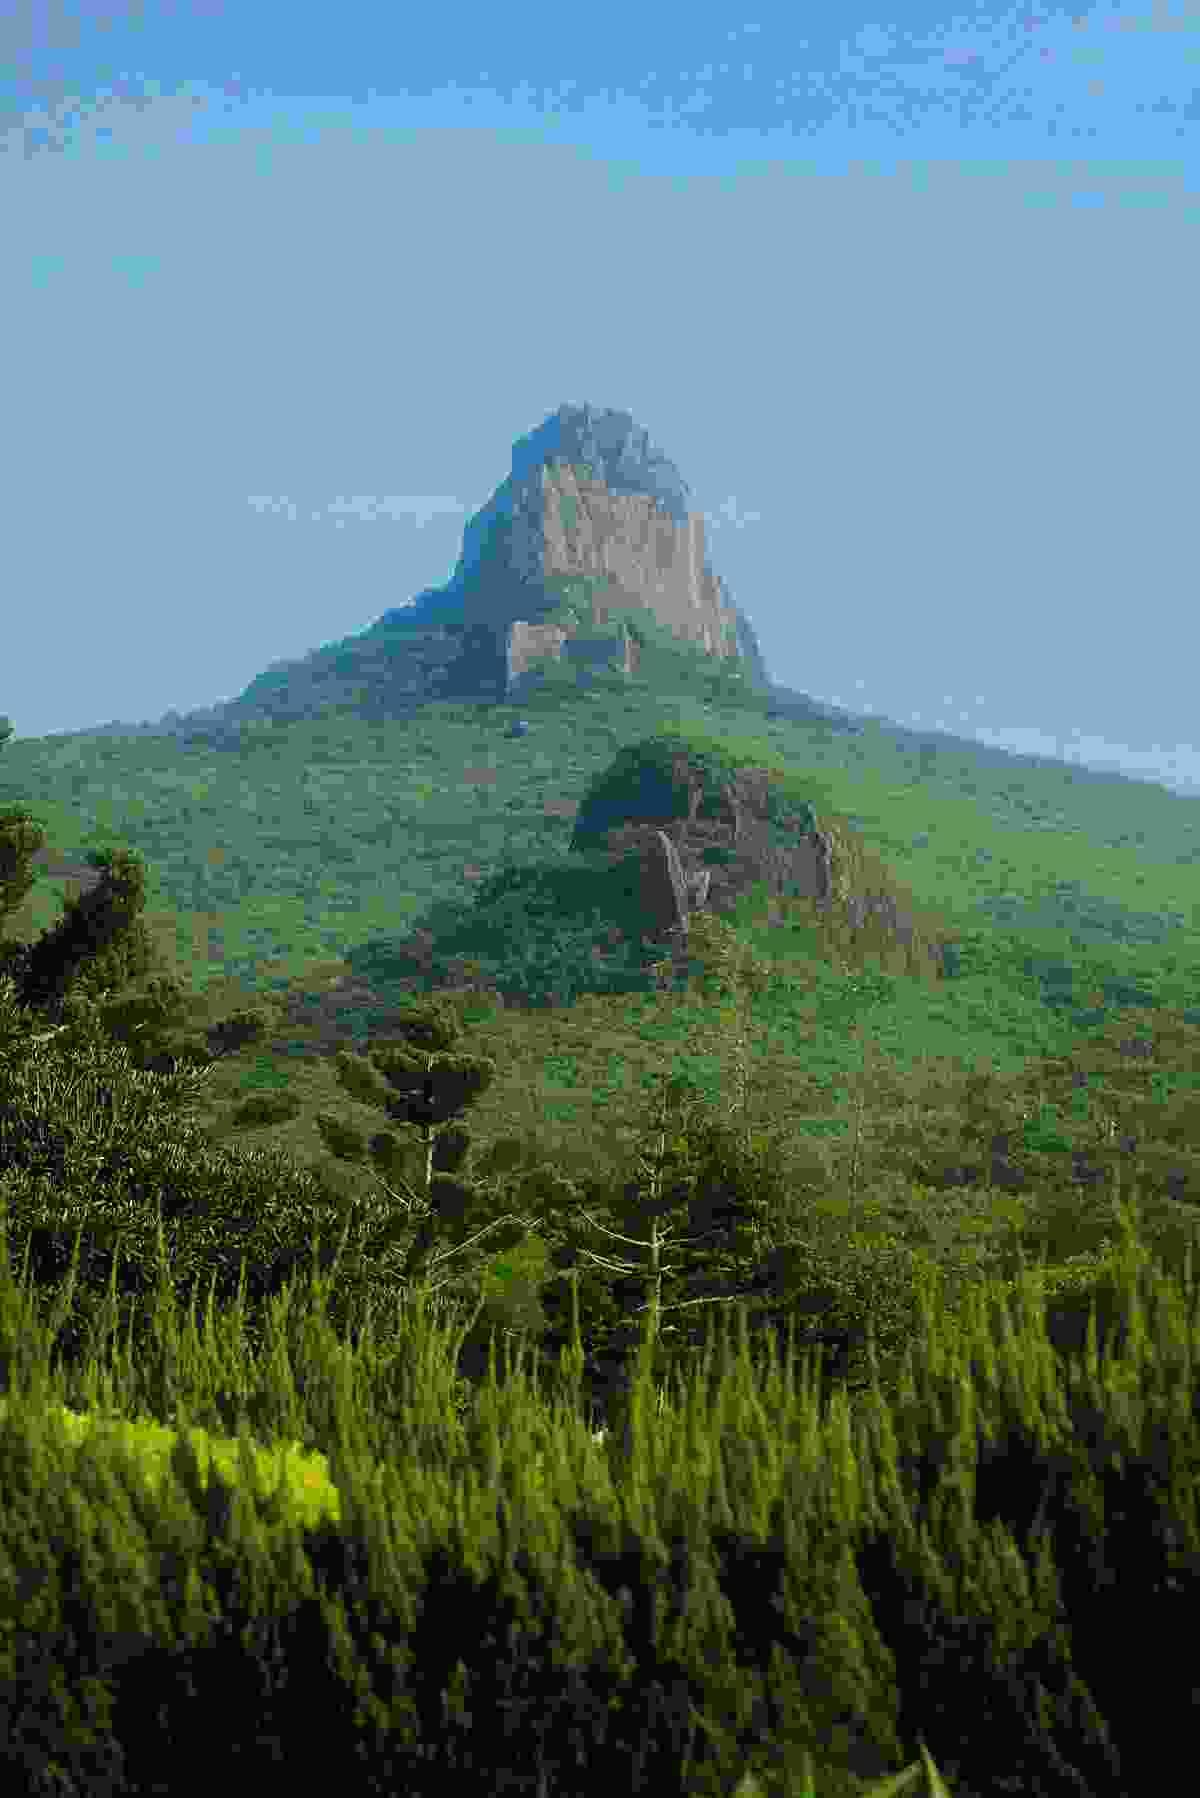 Gazing up at the pyramid-shaped Kenting Mountain (Mark Stratton)